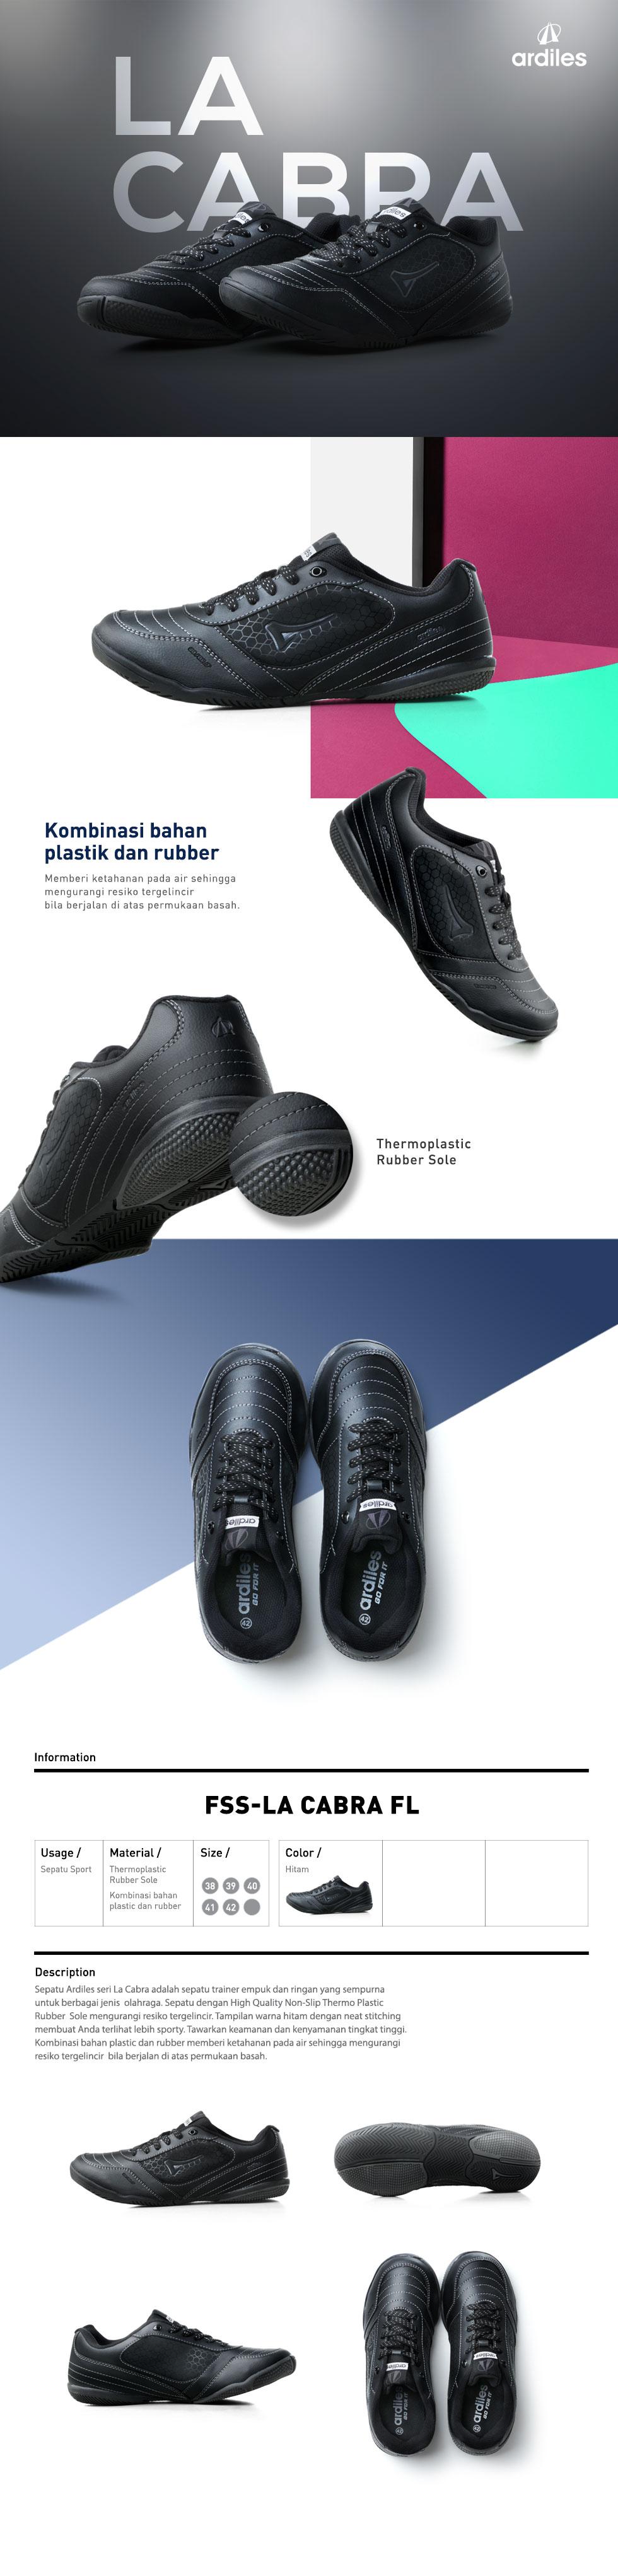 Ardiles Men La Cabra Futsal Shoes Hitam Daftar Harga Terkini Biglio Sepatu Putih Emas 43 Opsi